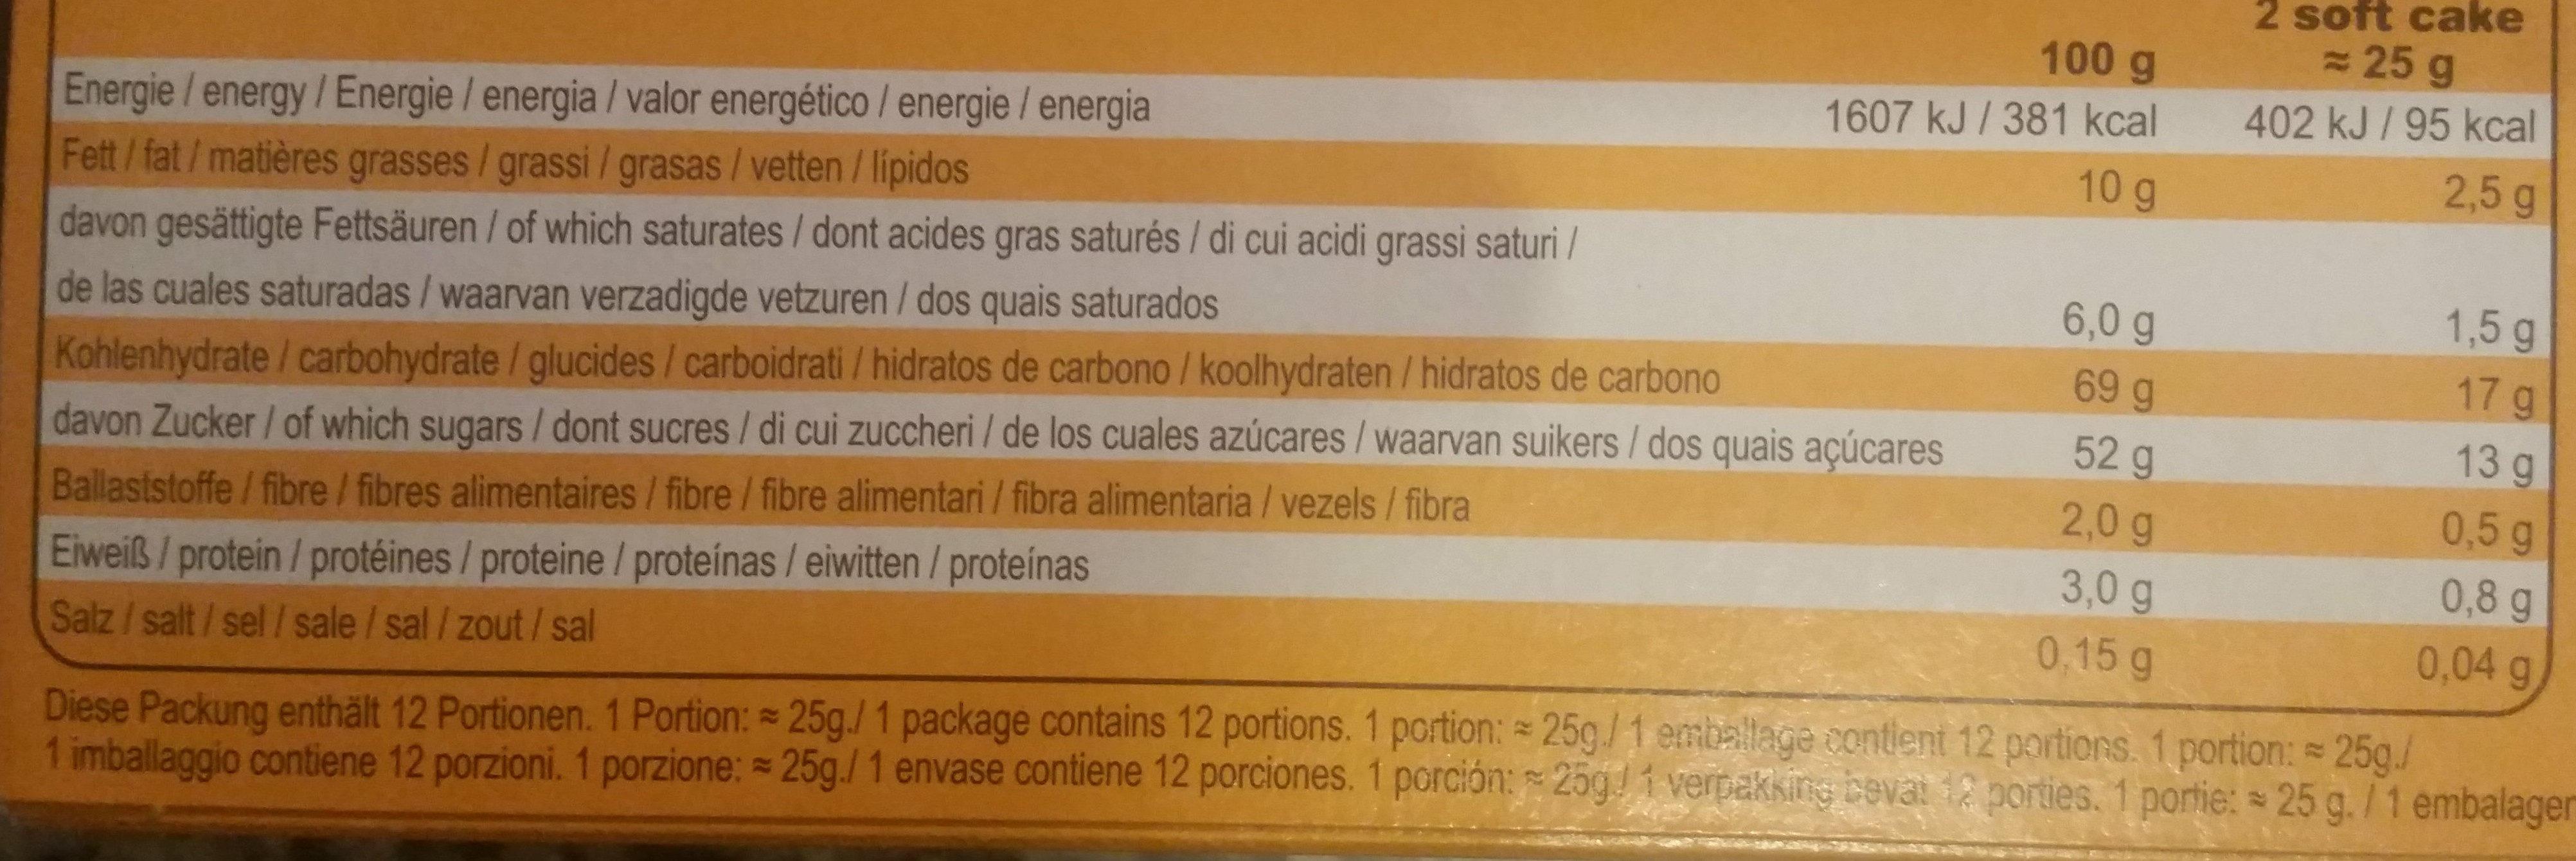 Soft Cake Orange - Voedingswaarden